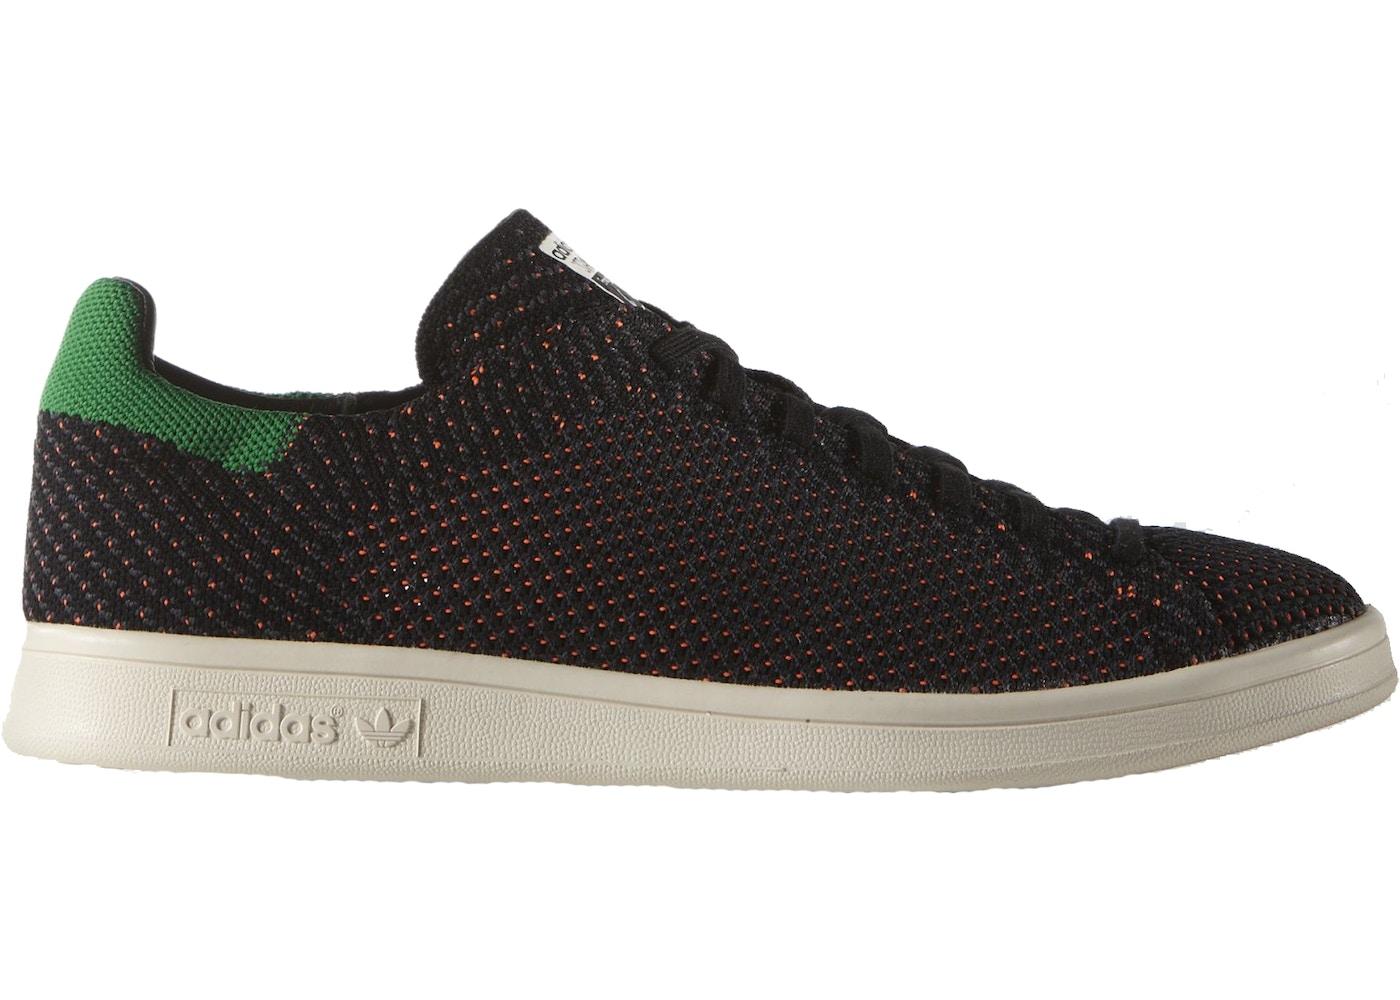 adidas Stan Smith Primeknit Black Green Orange S82633